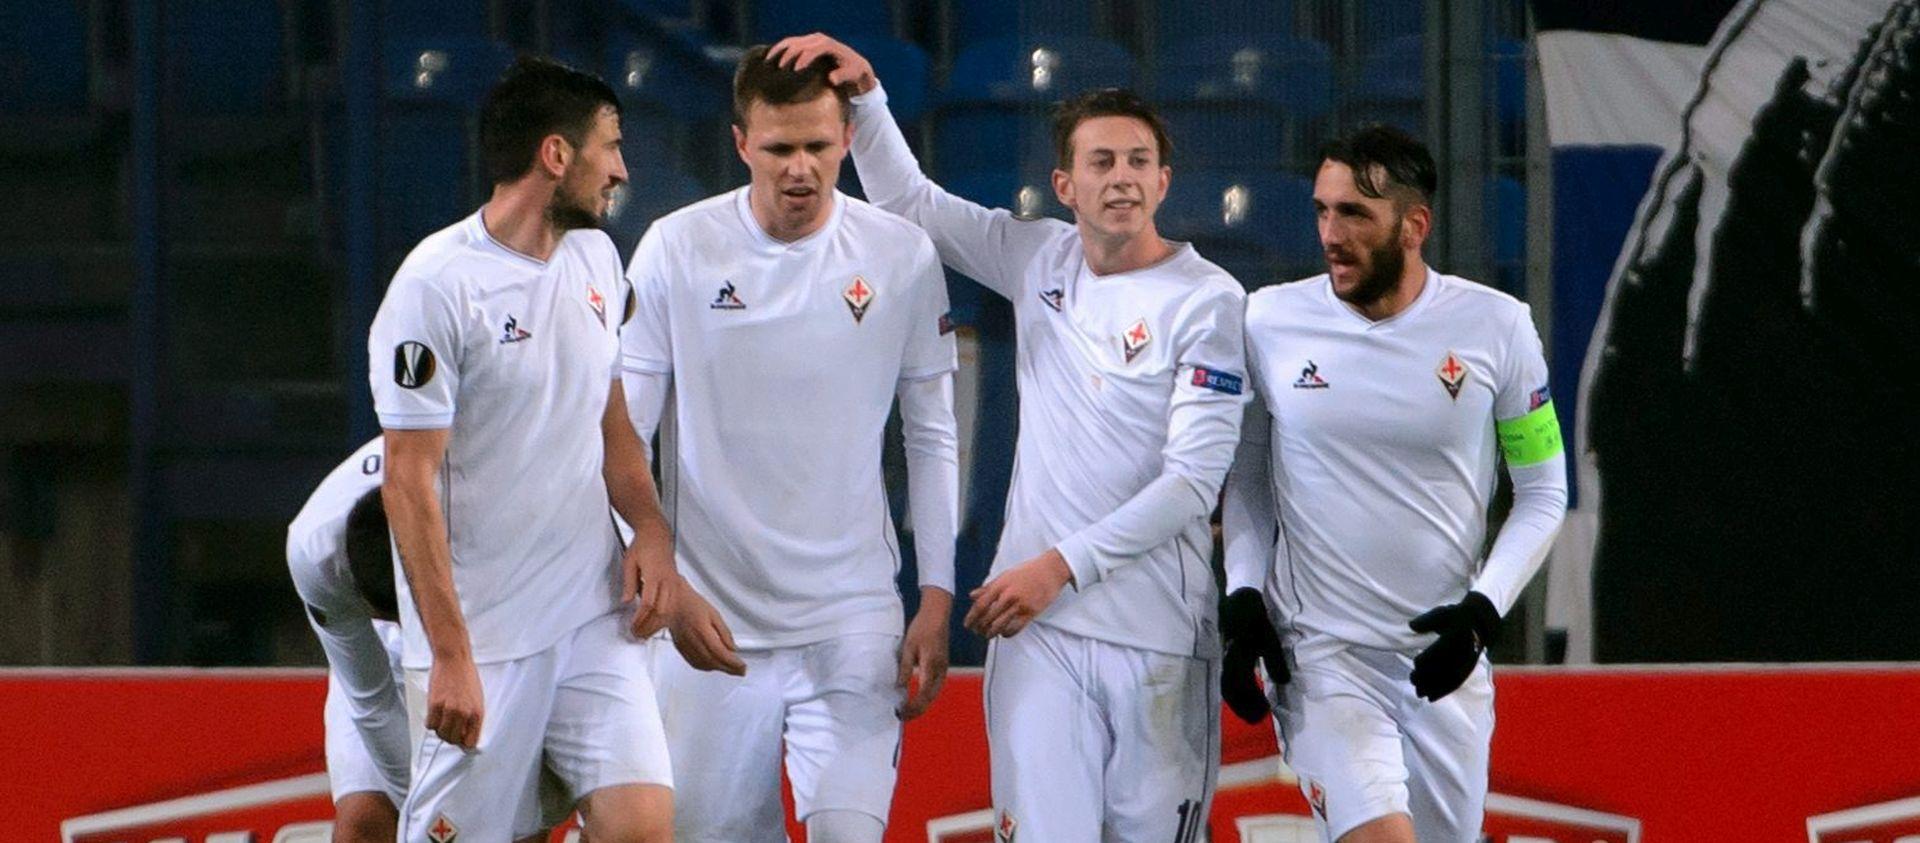 EUROPA LIGA Skenderbeu 'razbio' Sporting, pobjeda Fiorentine, nastupili Kalinić i Badelj